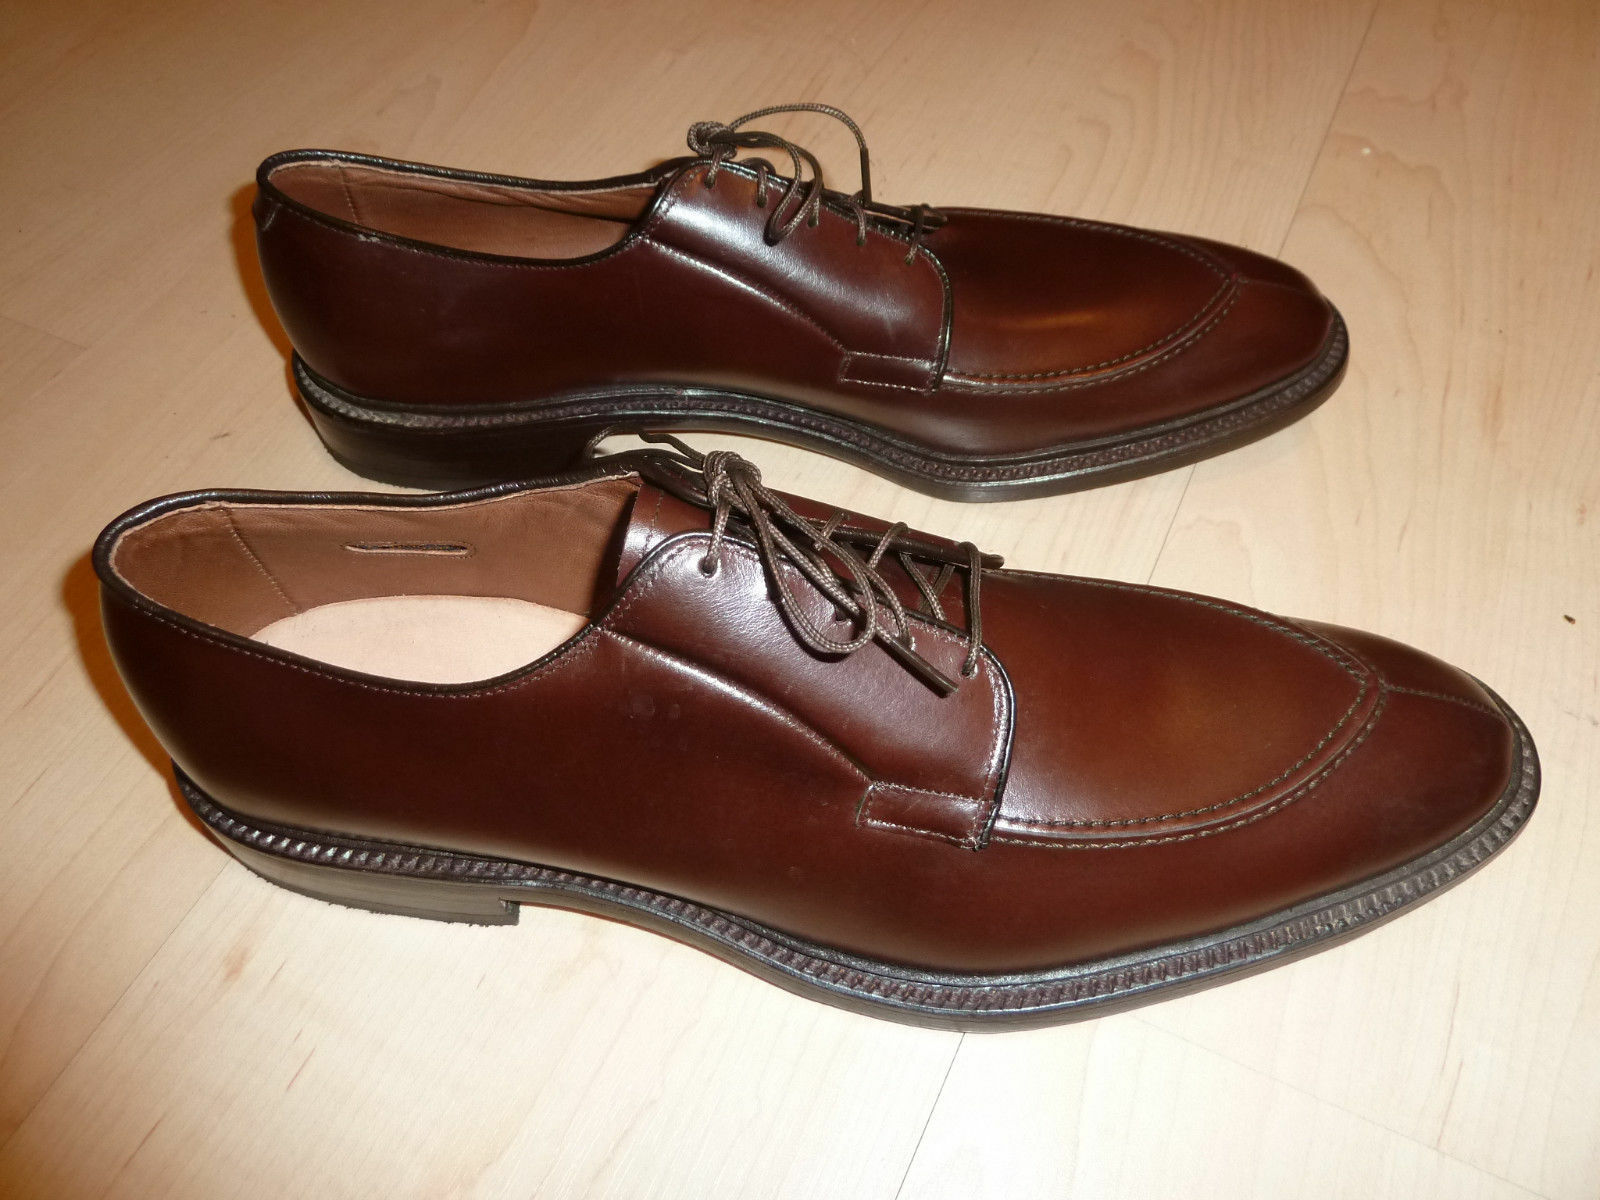 migliore qualità NEW  350 350 350 ALLEN EDMONDS Brentwood Sz 12 AAAA 4A Dress scarpe Leather Made in USA  scelta migliore